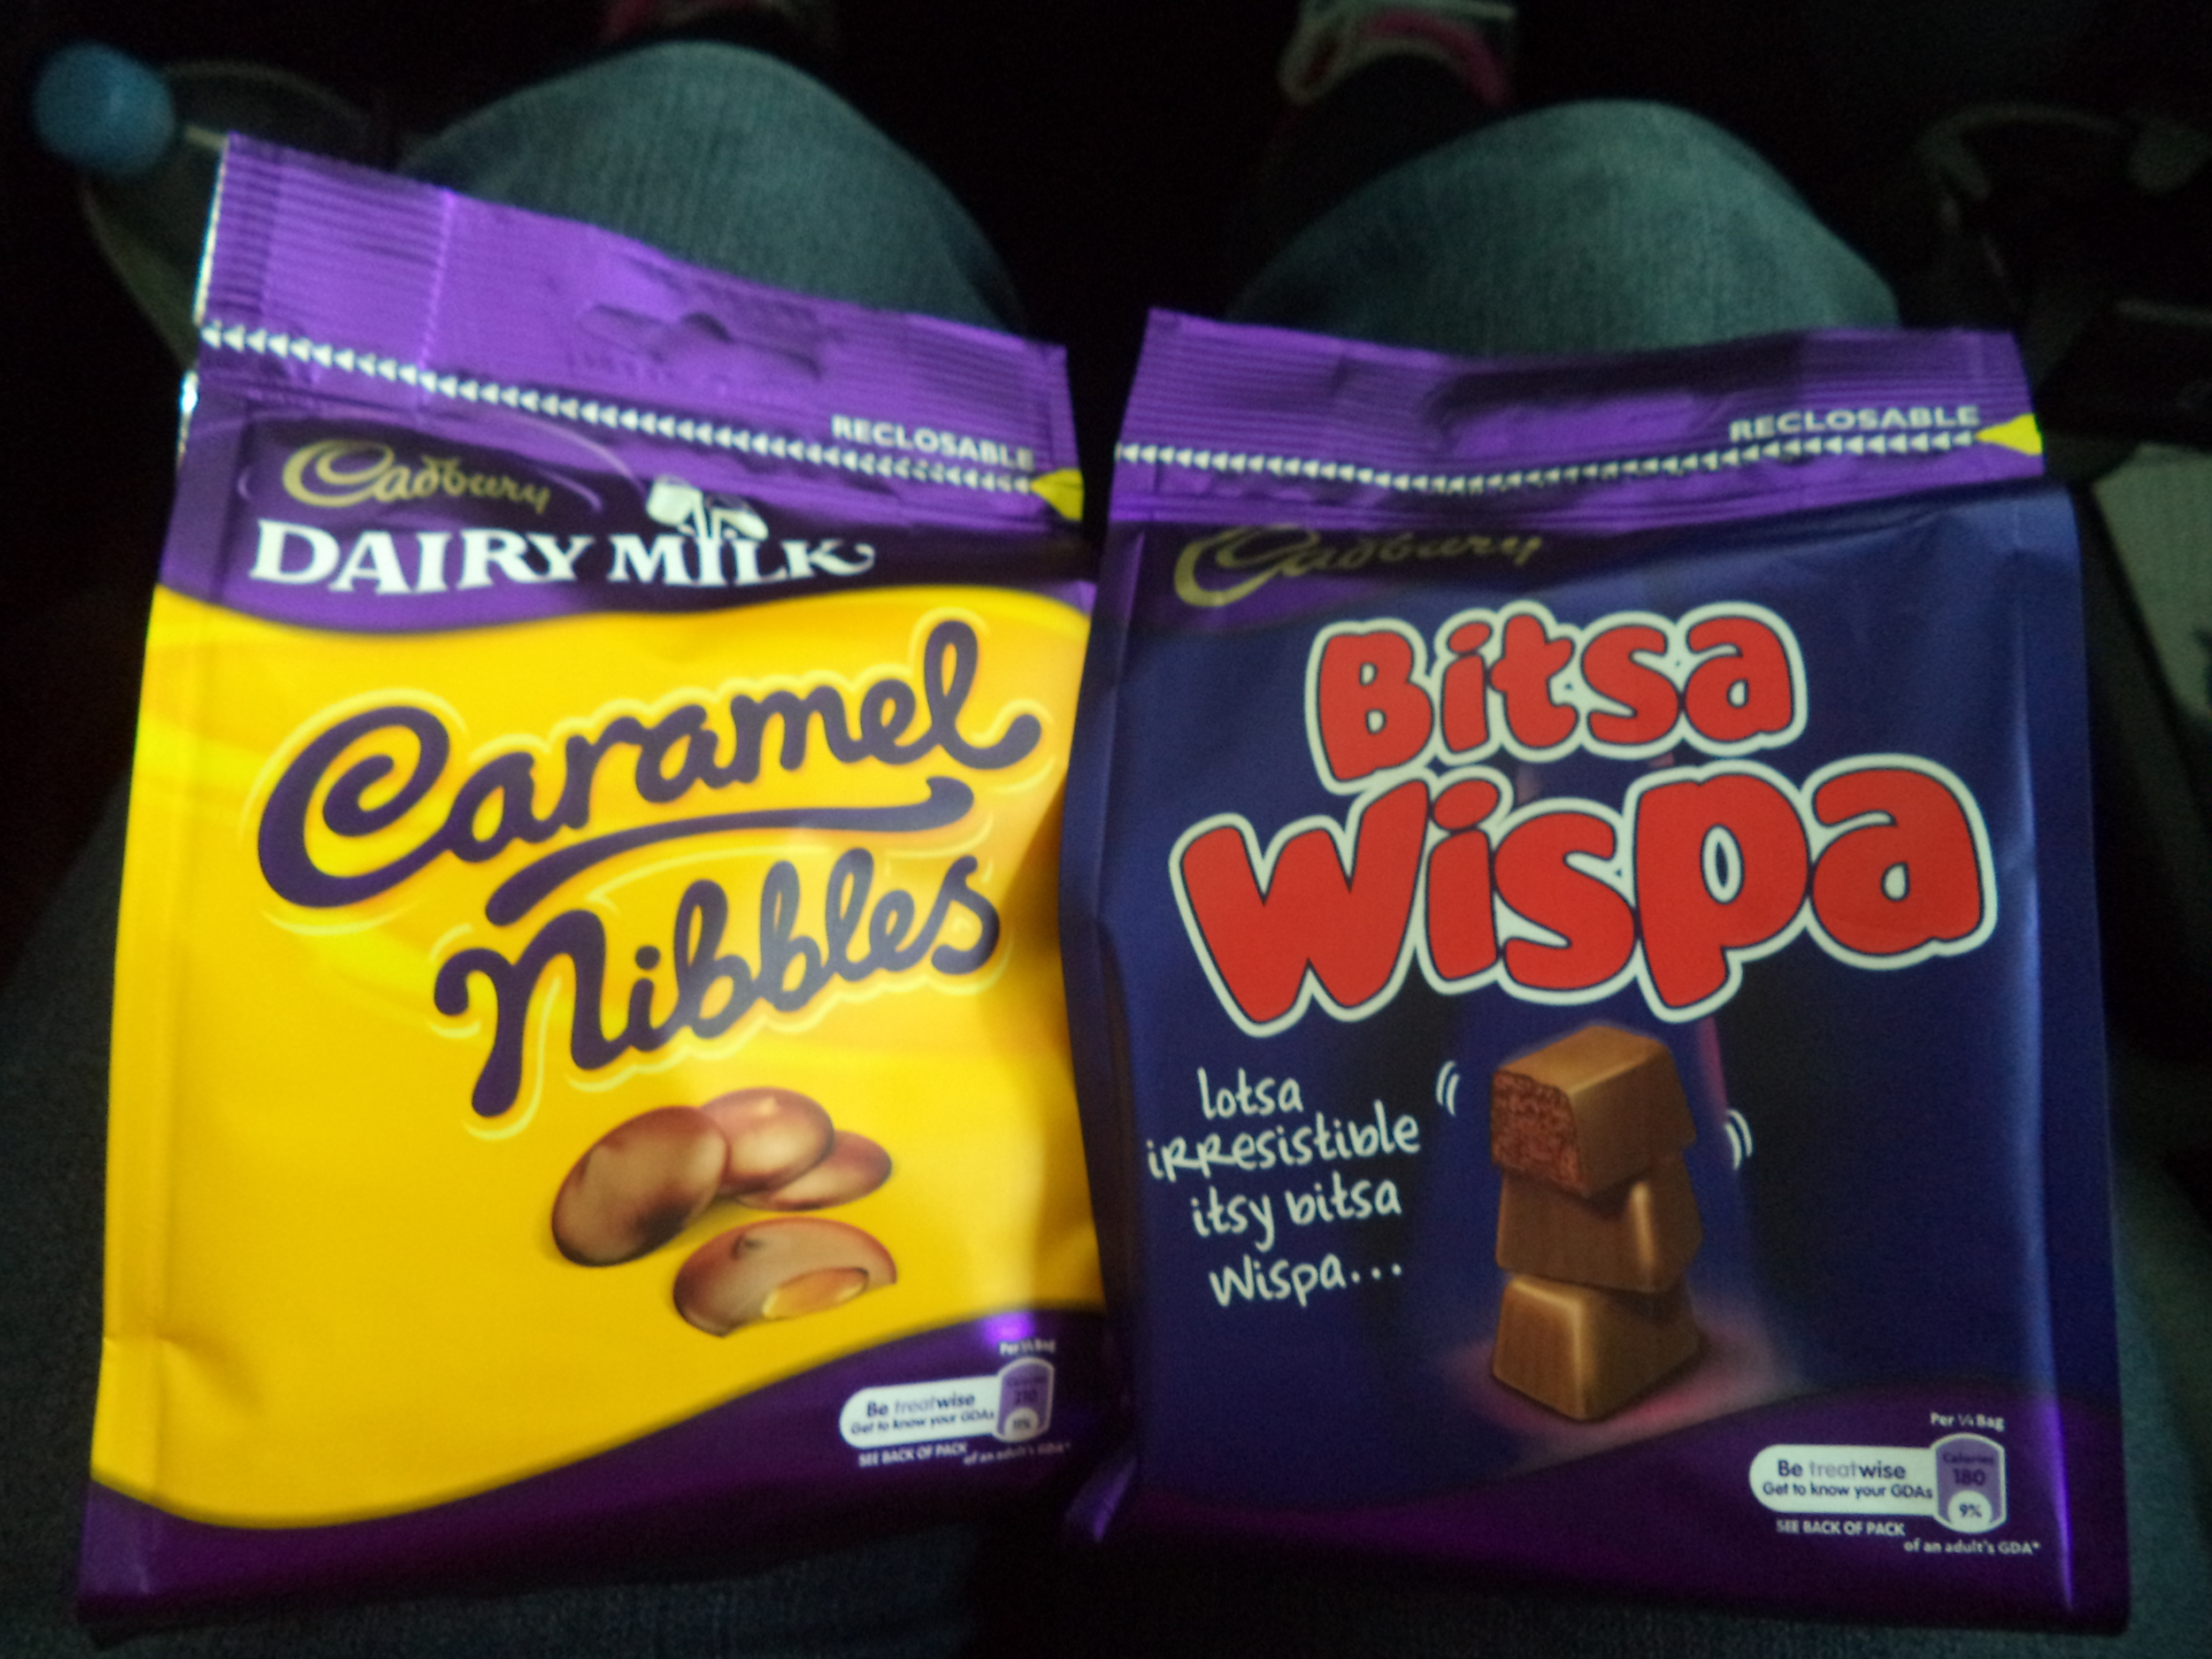 Cadbury Bitsa Wispa and Caramel Nibbles.